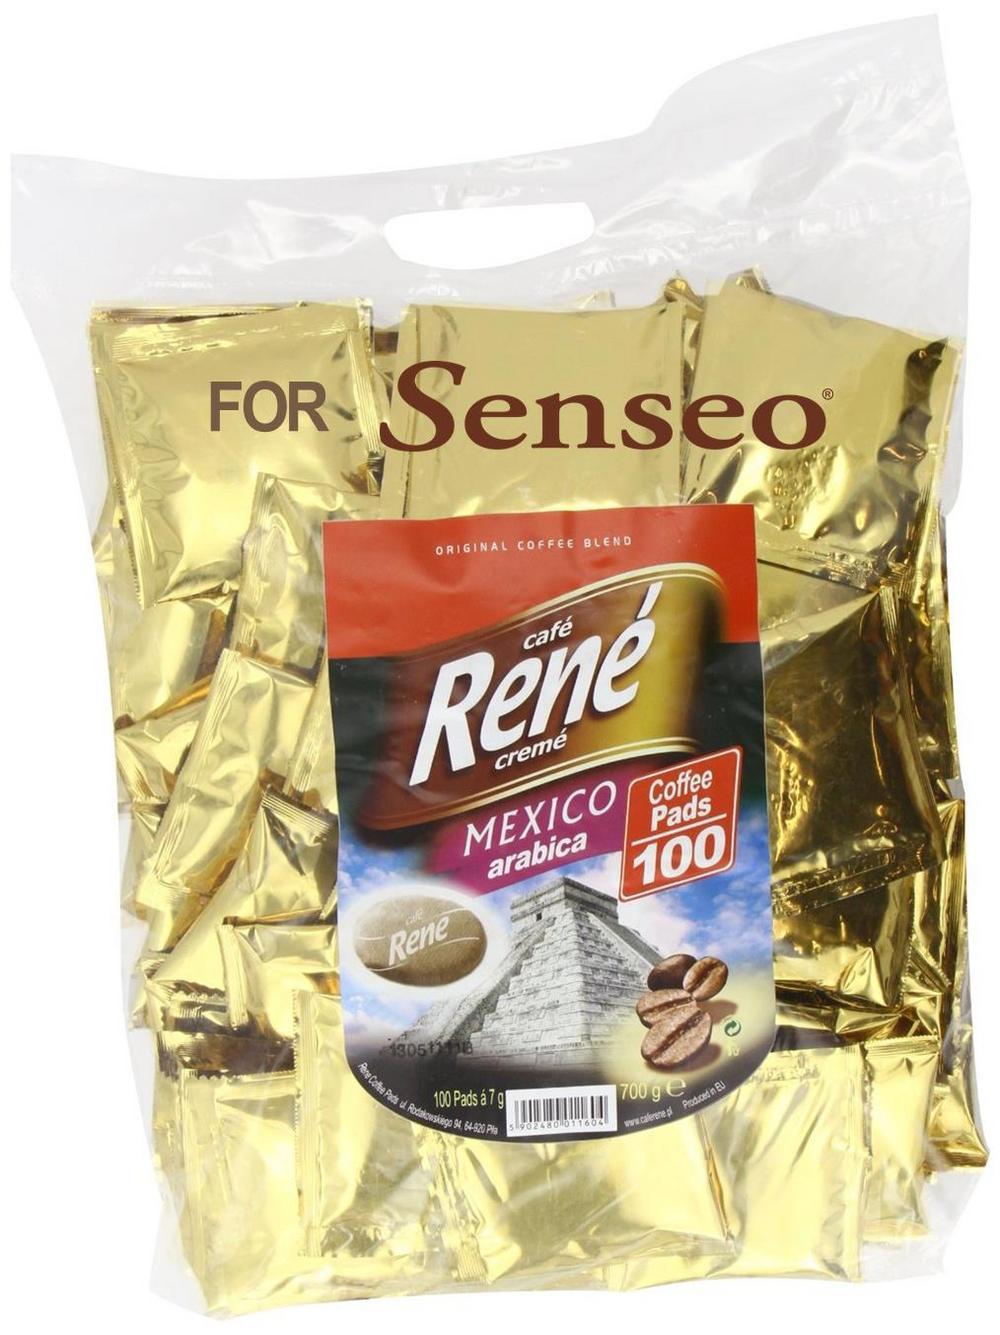 Philips Senseo 100 x Café Rene Crème Mexico Coffee Pads Bags Pods